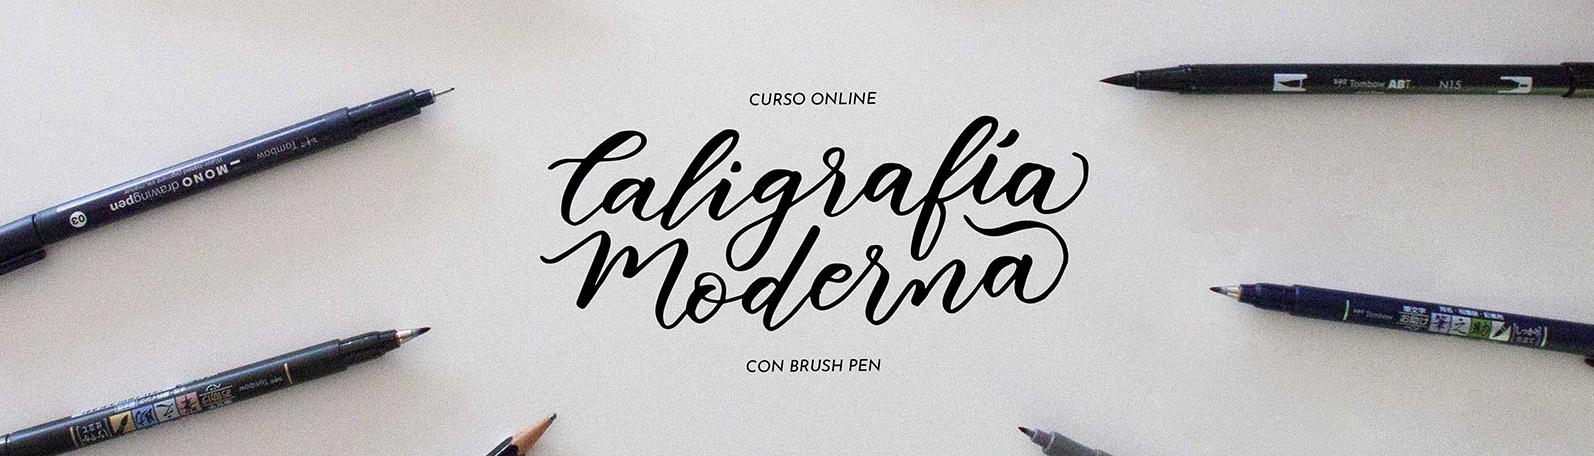 curso_online_caligrafia_moderna_el_amante_volador_9_